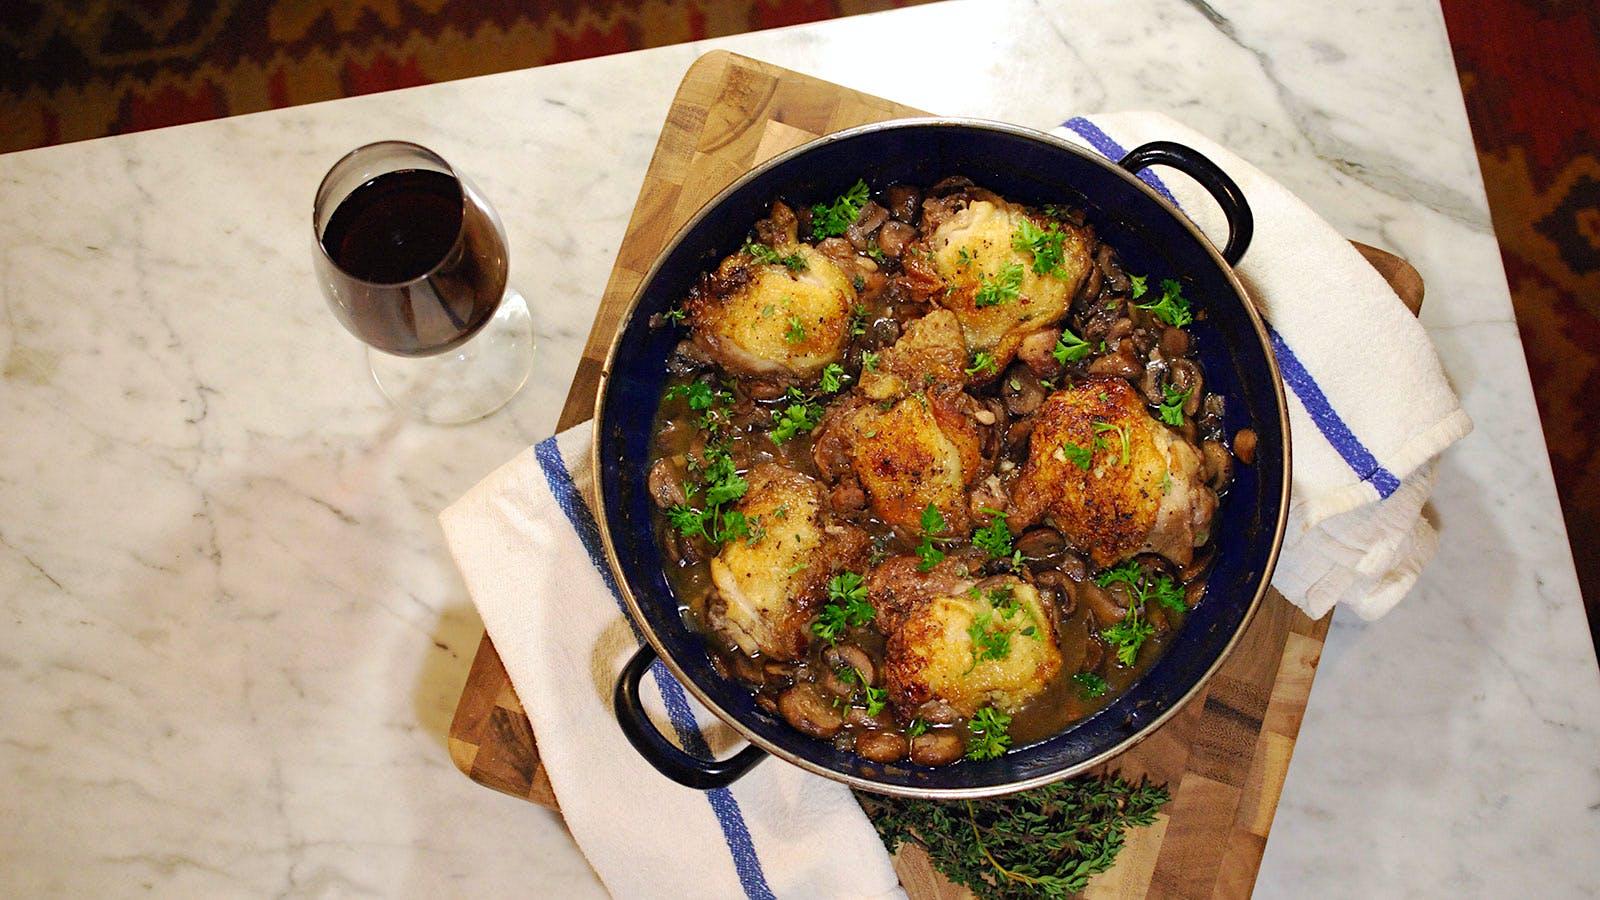 Braised Chicken Thighs in Mushroom Sauce